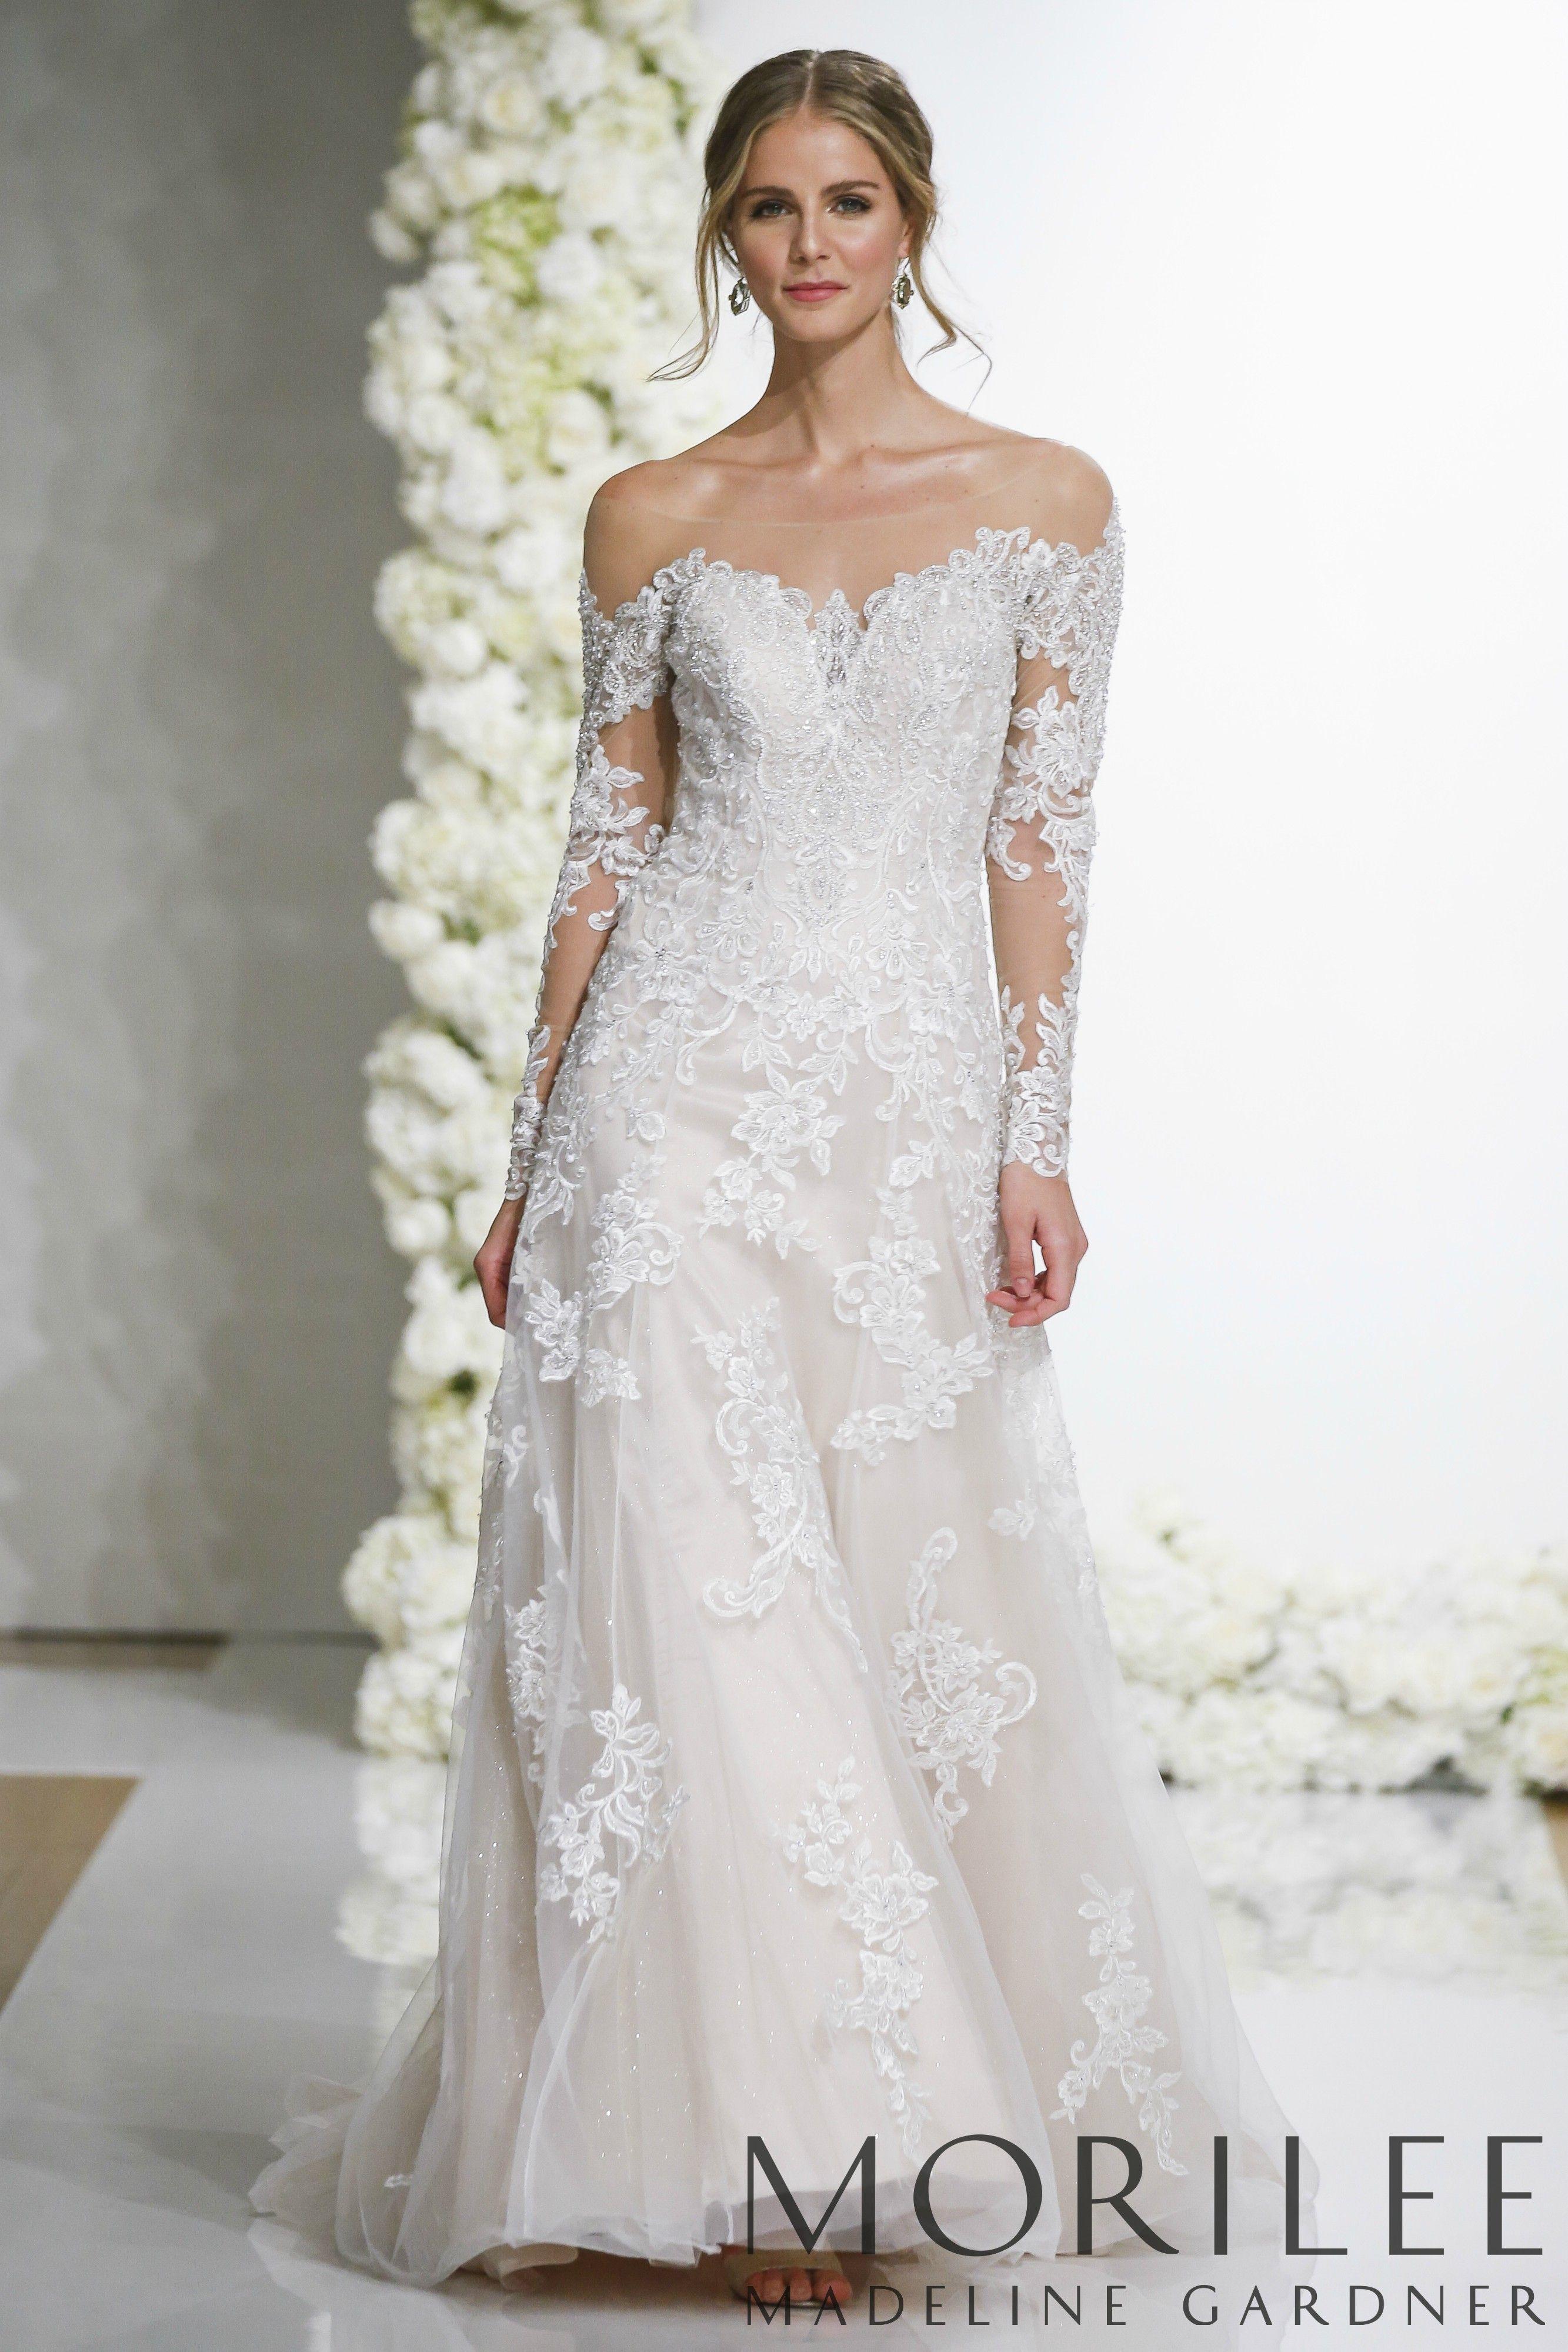 Leighton Wedding Dress Morilee Wedding Dress Long Sleeve Elegant Wedding Dress Wedding Dresses Lace